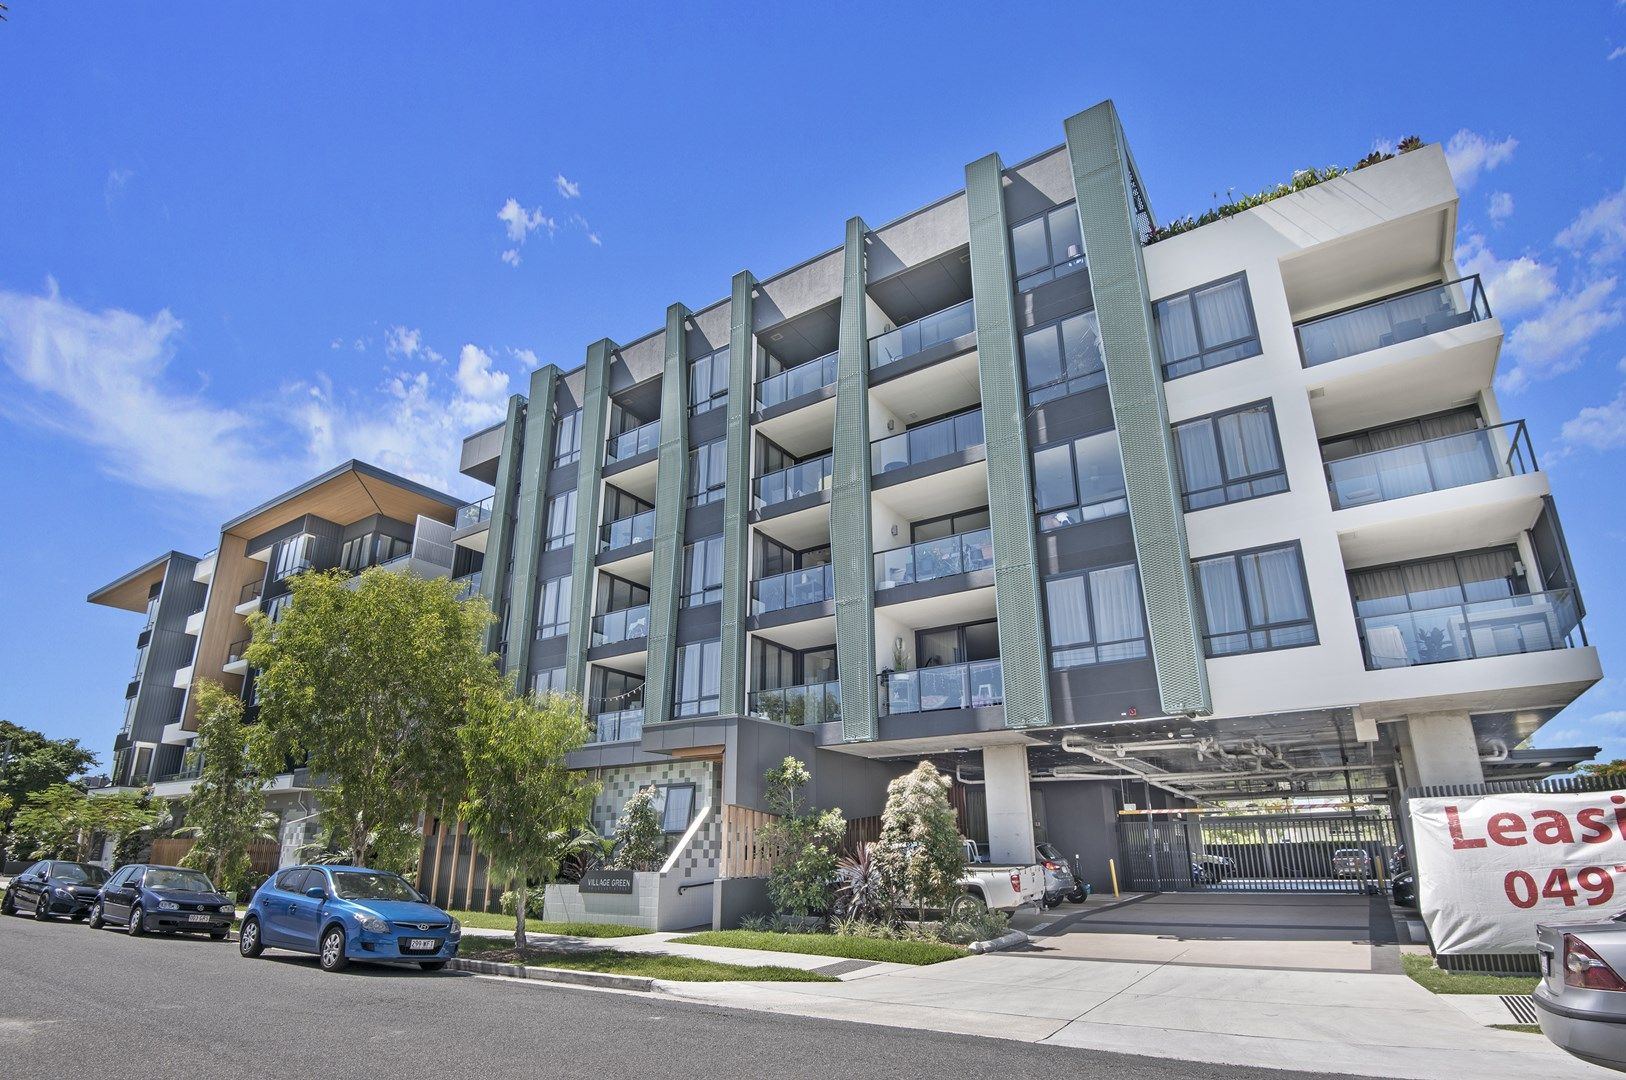 207/42 Jenner Street, Nundah QLD 4012, Image 0